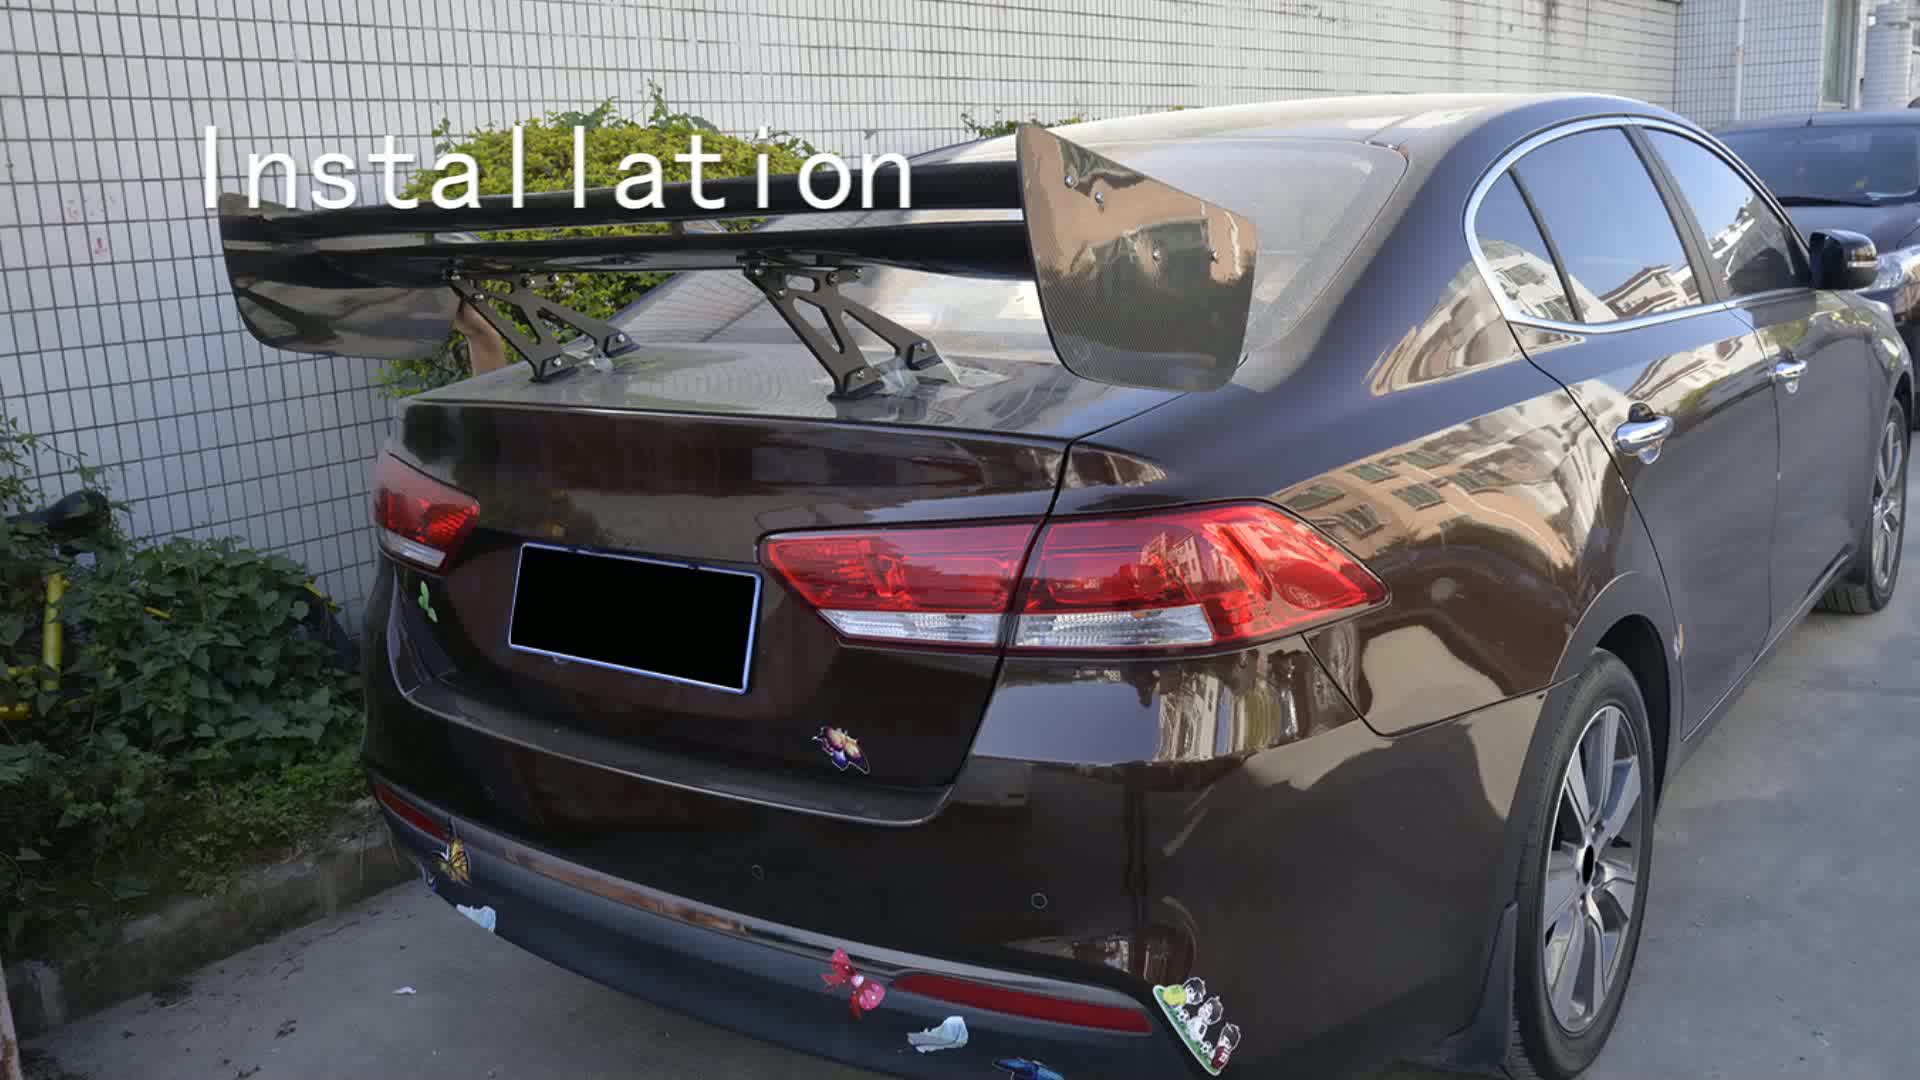 Universal คาร์บอนไฟเบอร์สปอยเลอร์ด้านหลังสำหรับ BMW Audi Volkswagen Ben z Toyota Nissa n GT